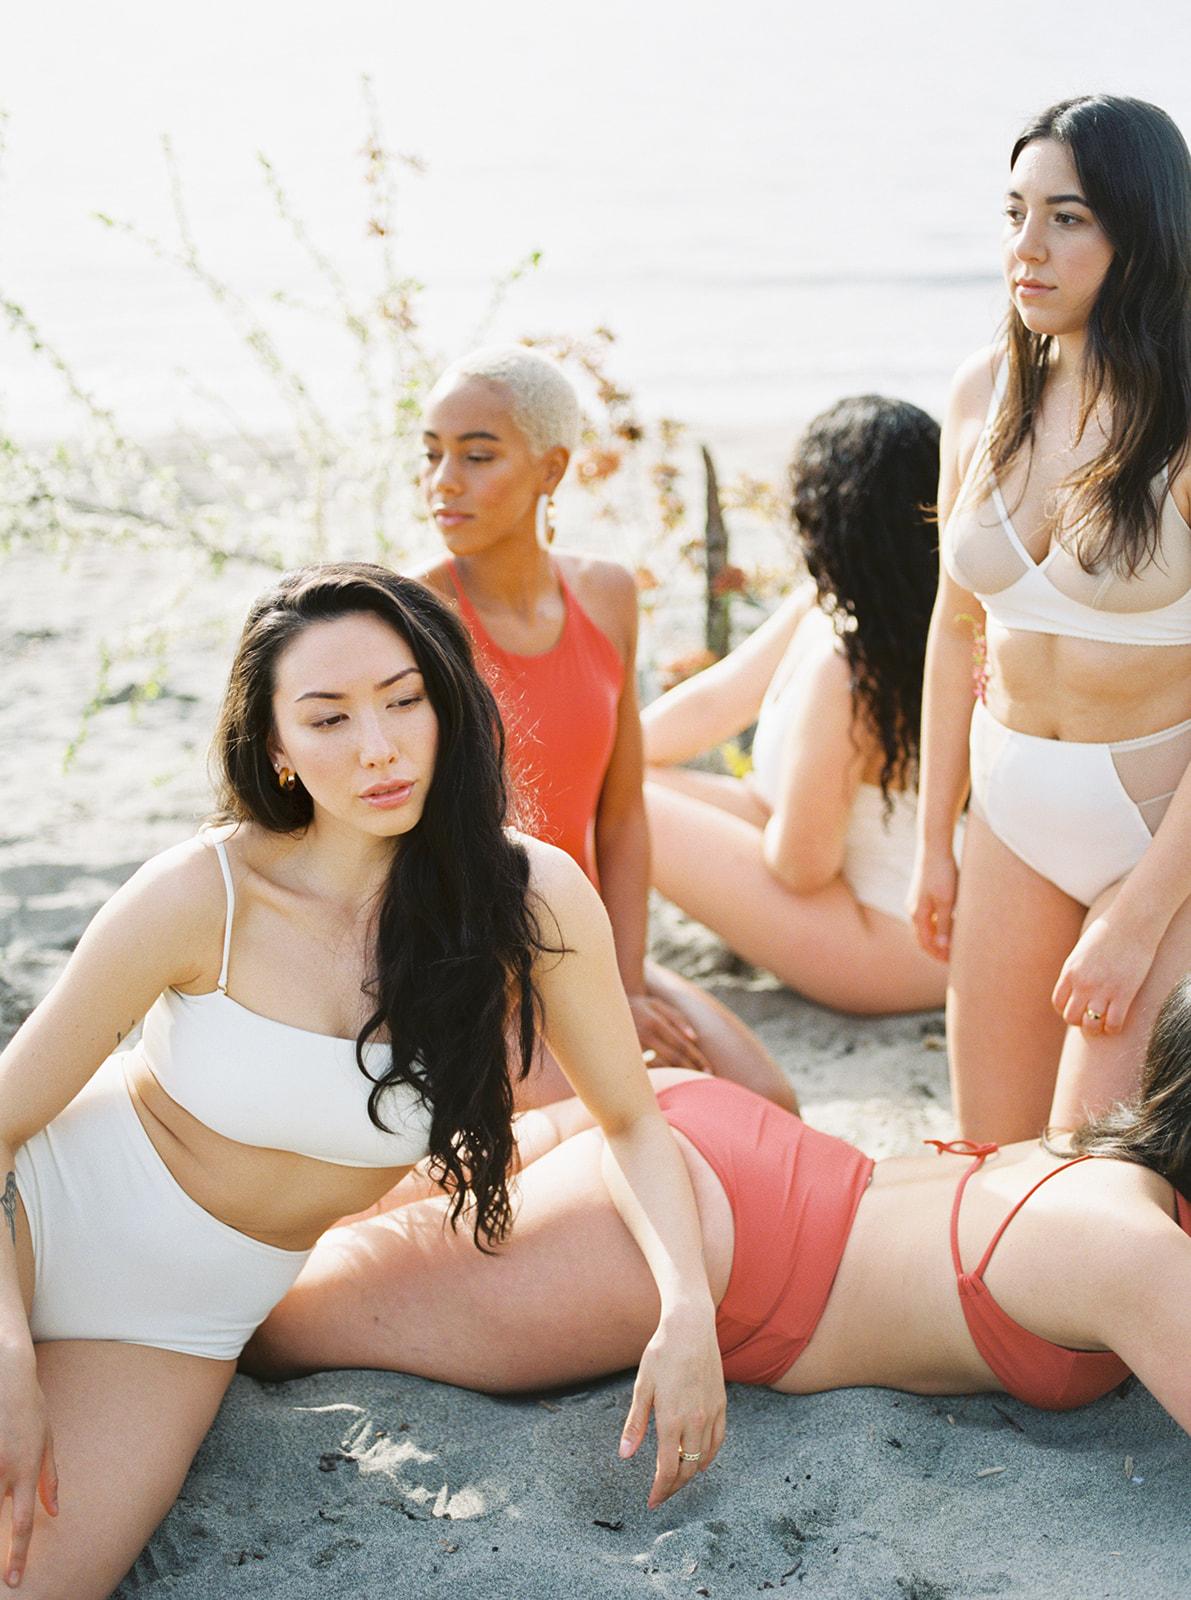 Femme_Editorial_JenzelVeloPhotograpy41.jpg